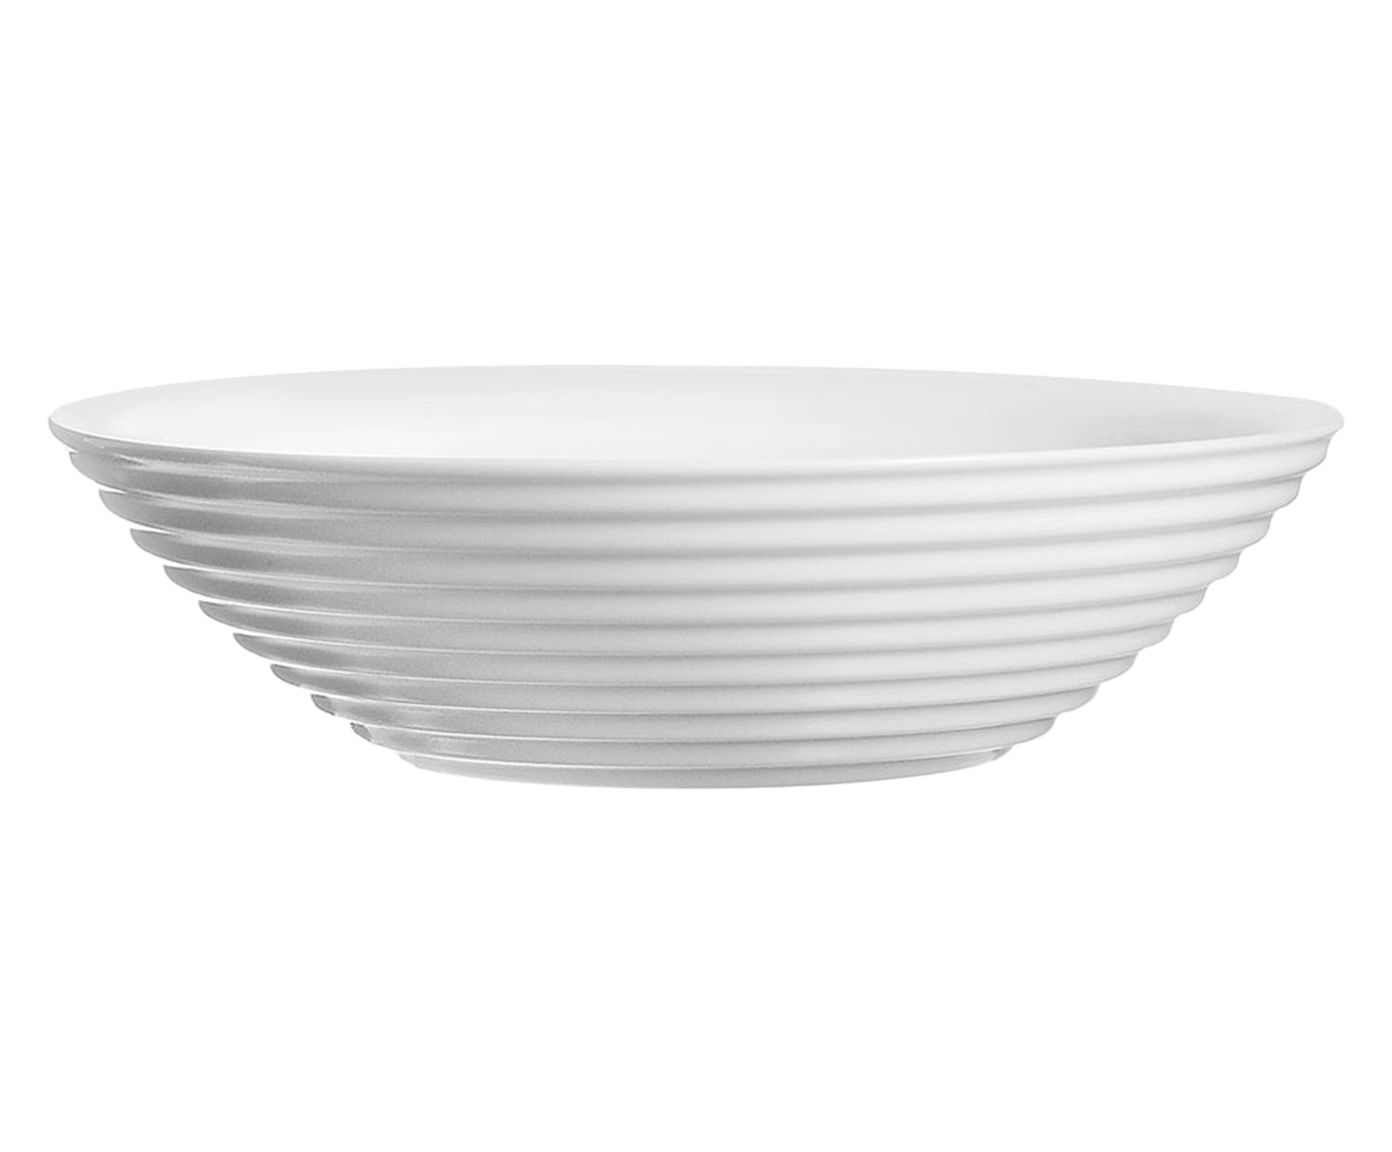 Bowl Harena Branco - 16X4,4cm | Westwing.com.br